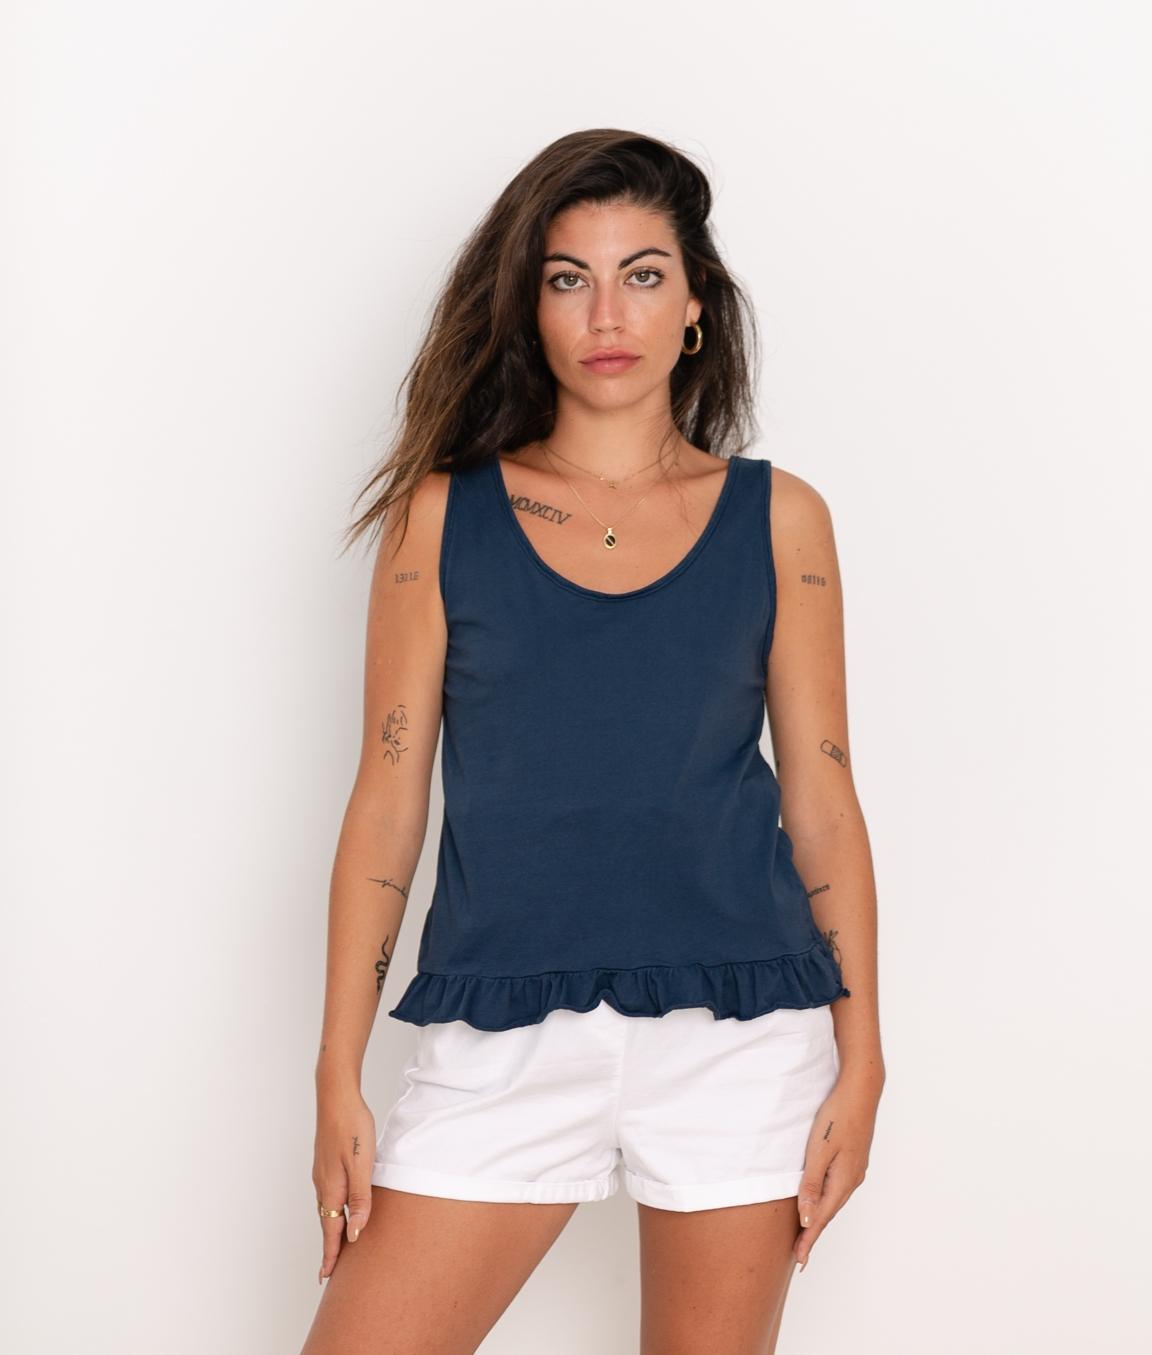 Camiseta Vela - Rosa